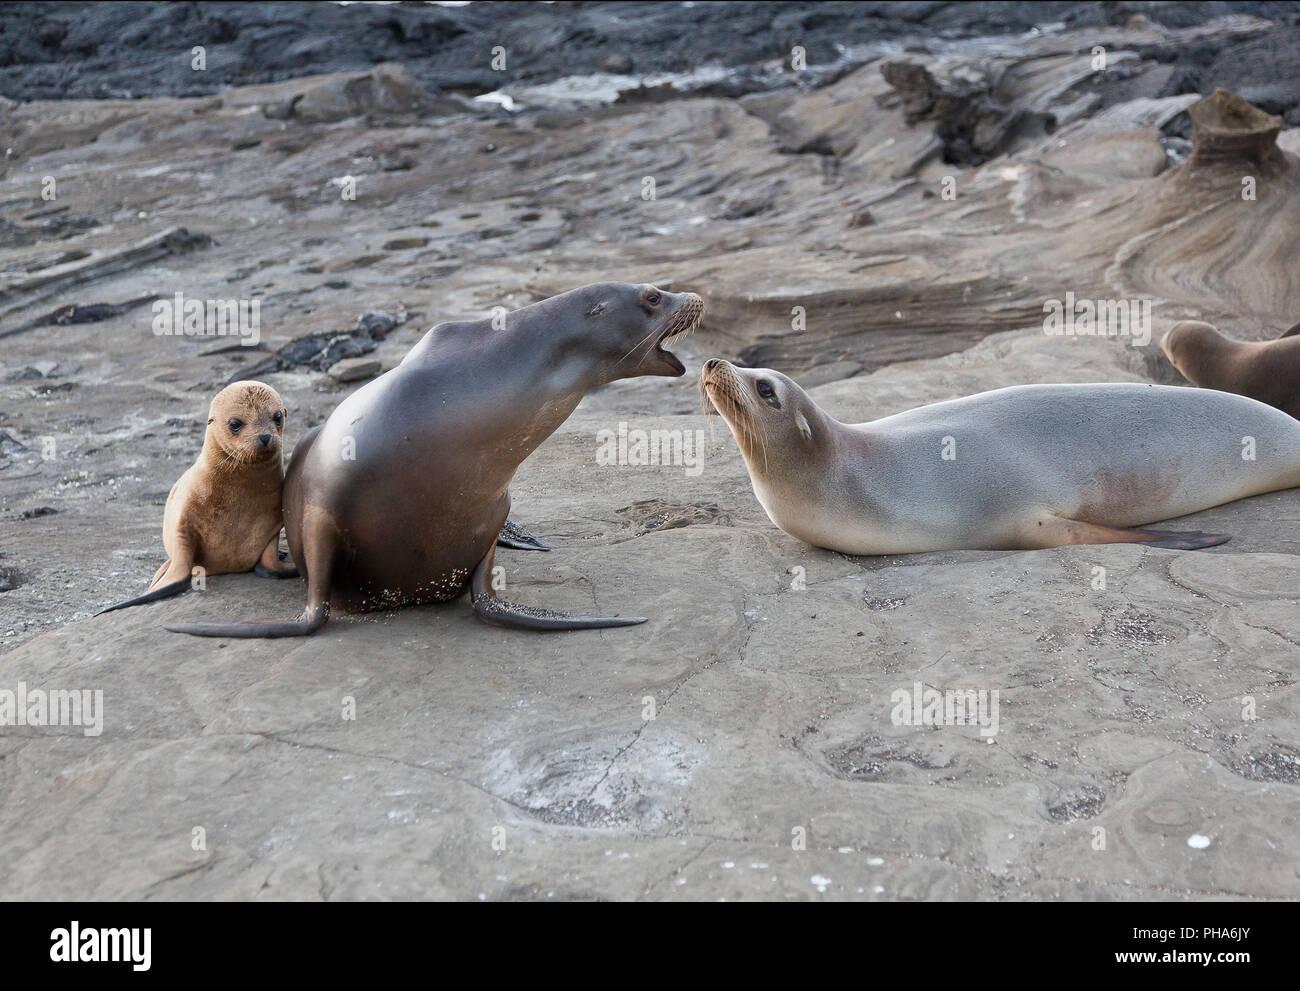 GALAPAGOS SEA LION WITH YOUNG ANIMAL - Stock Image